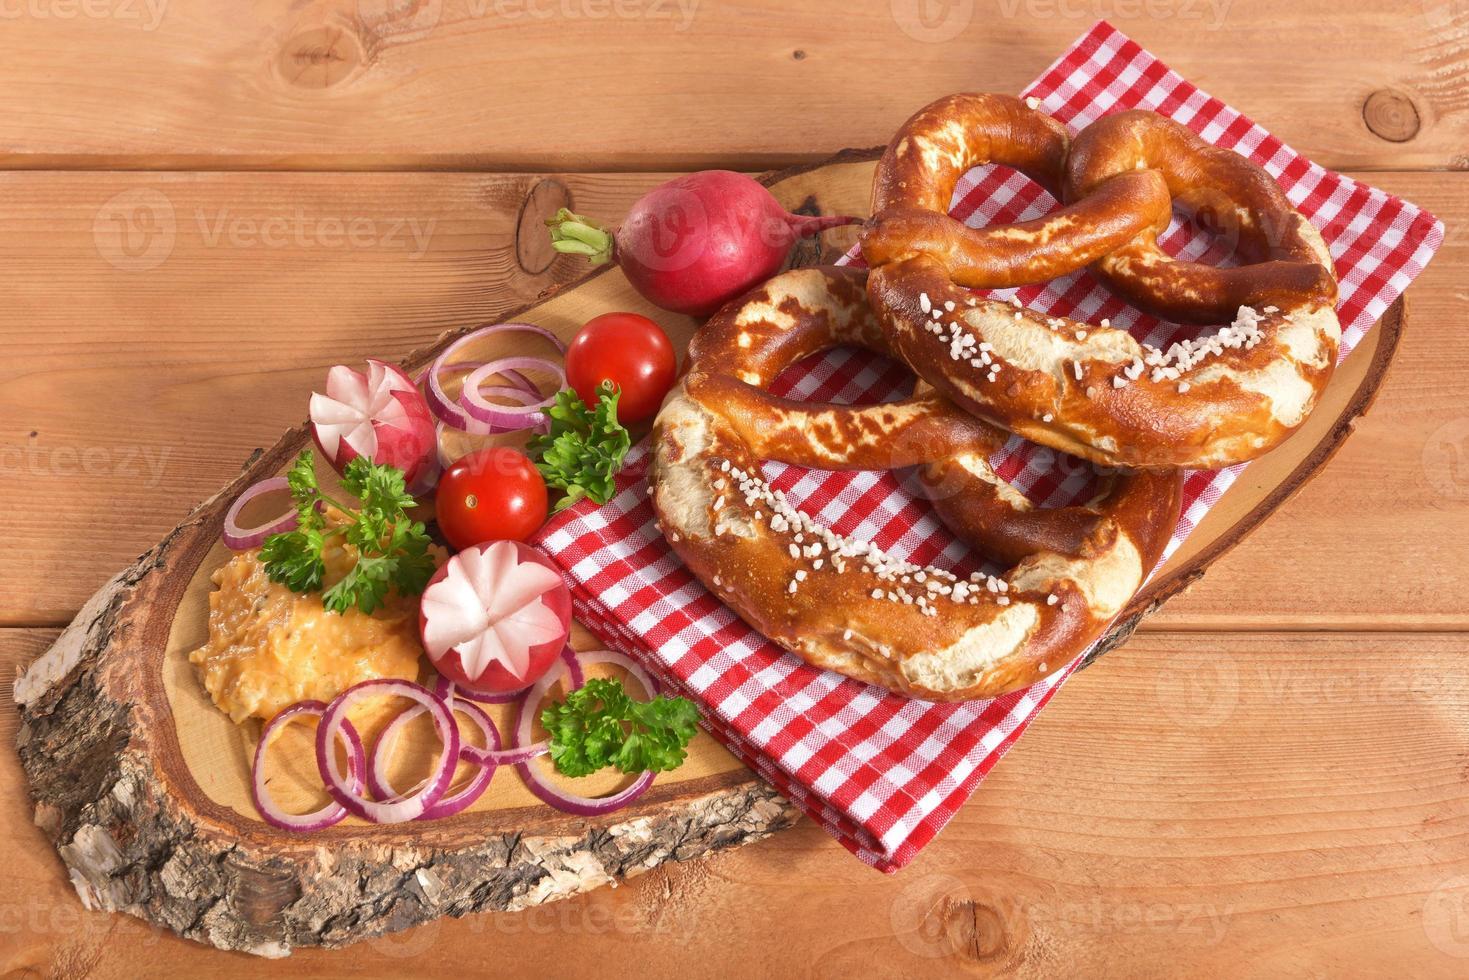 Beiers ontbijt foto